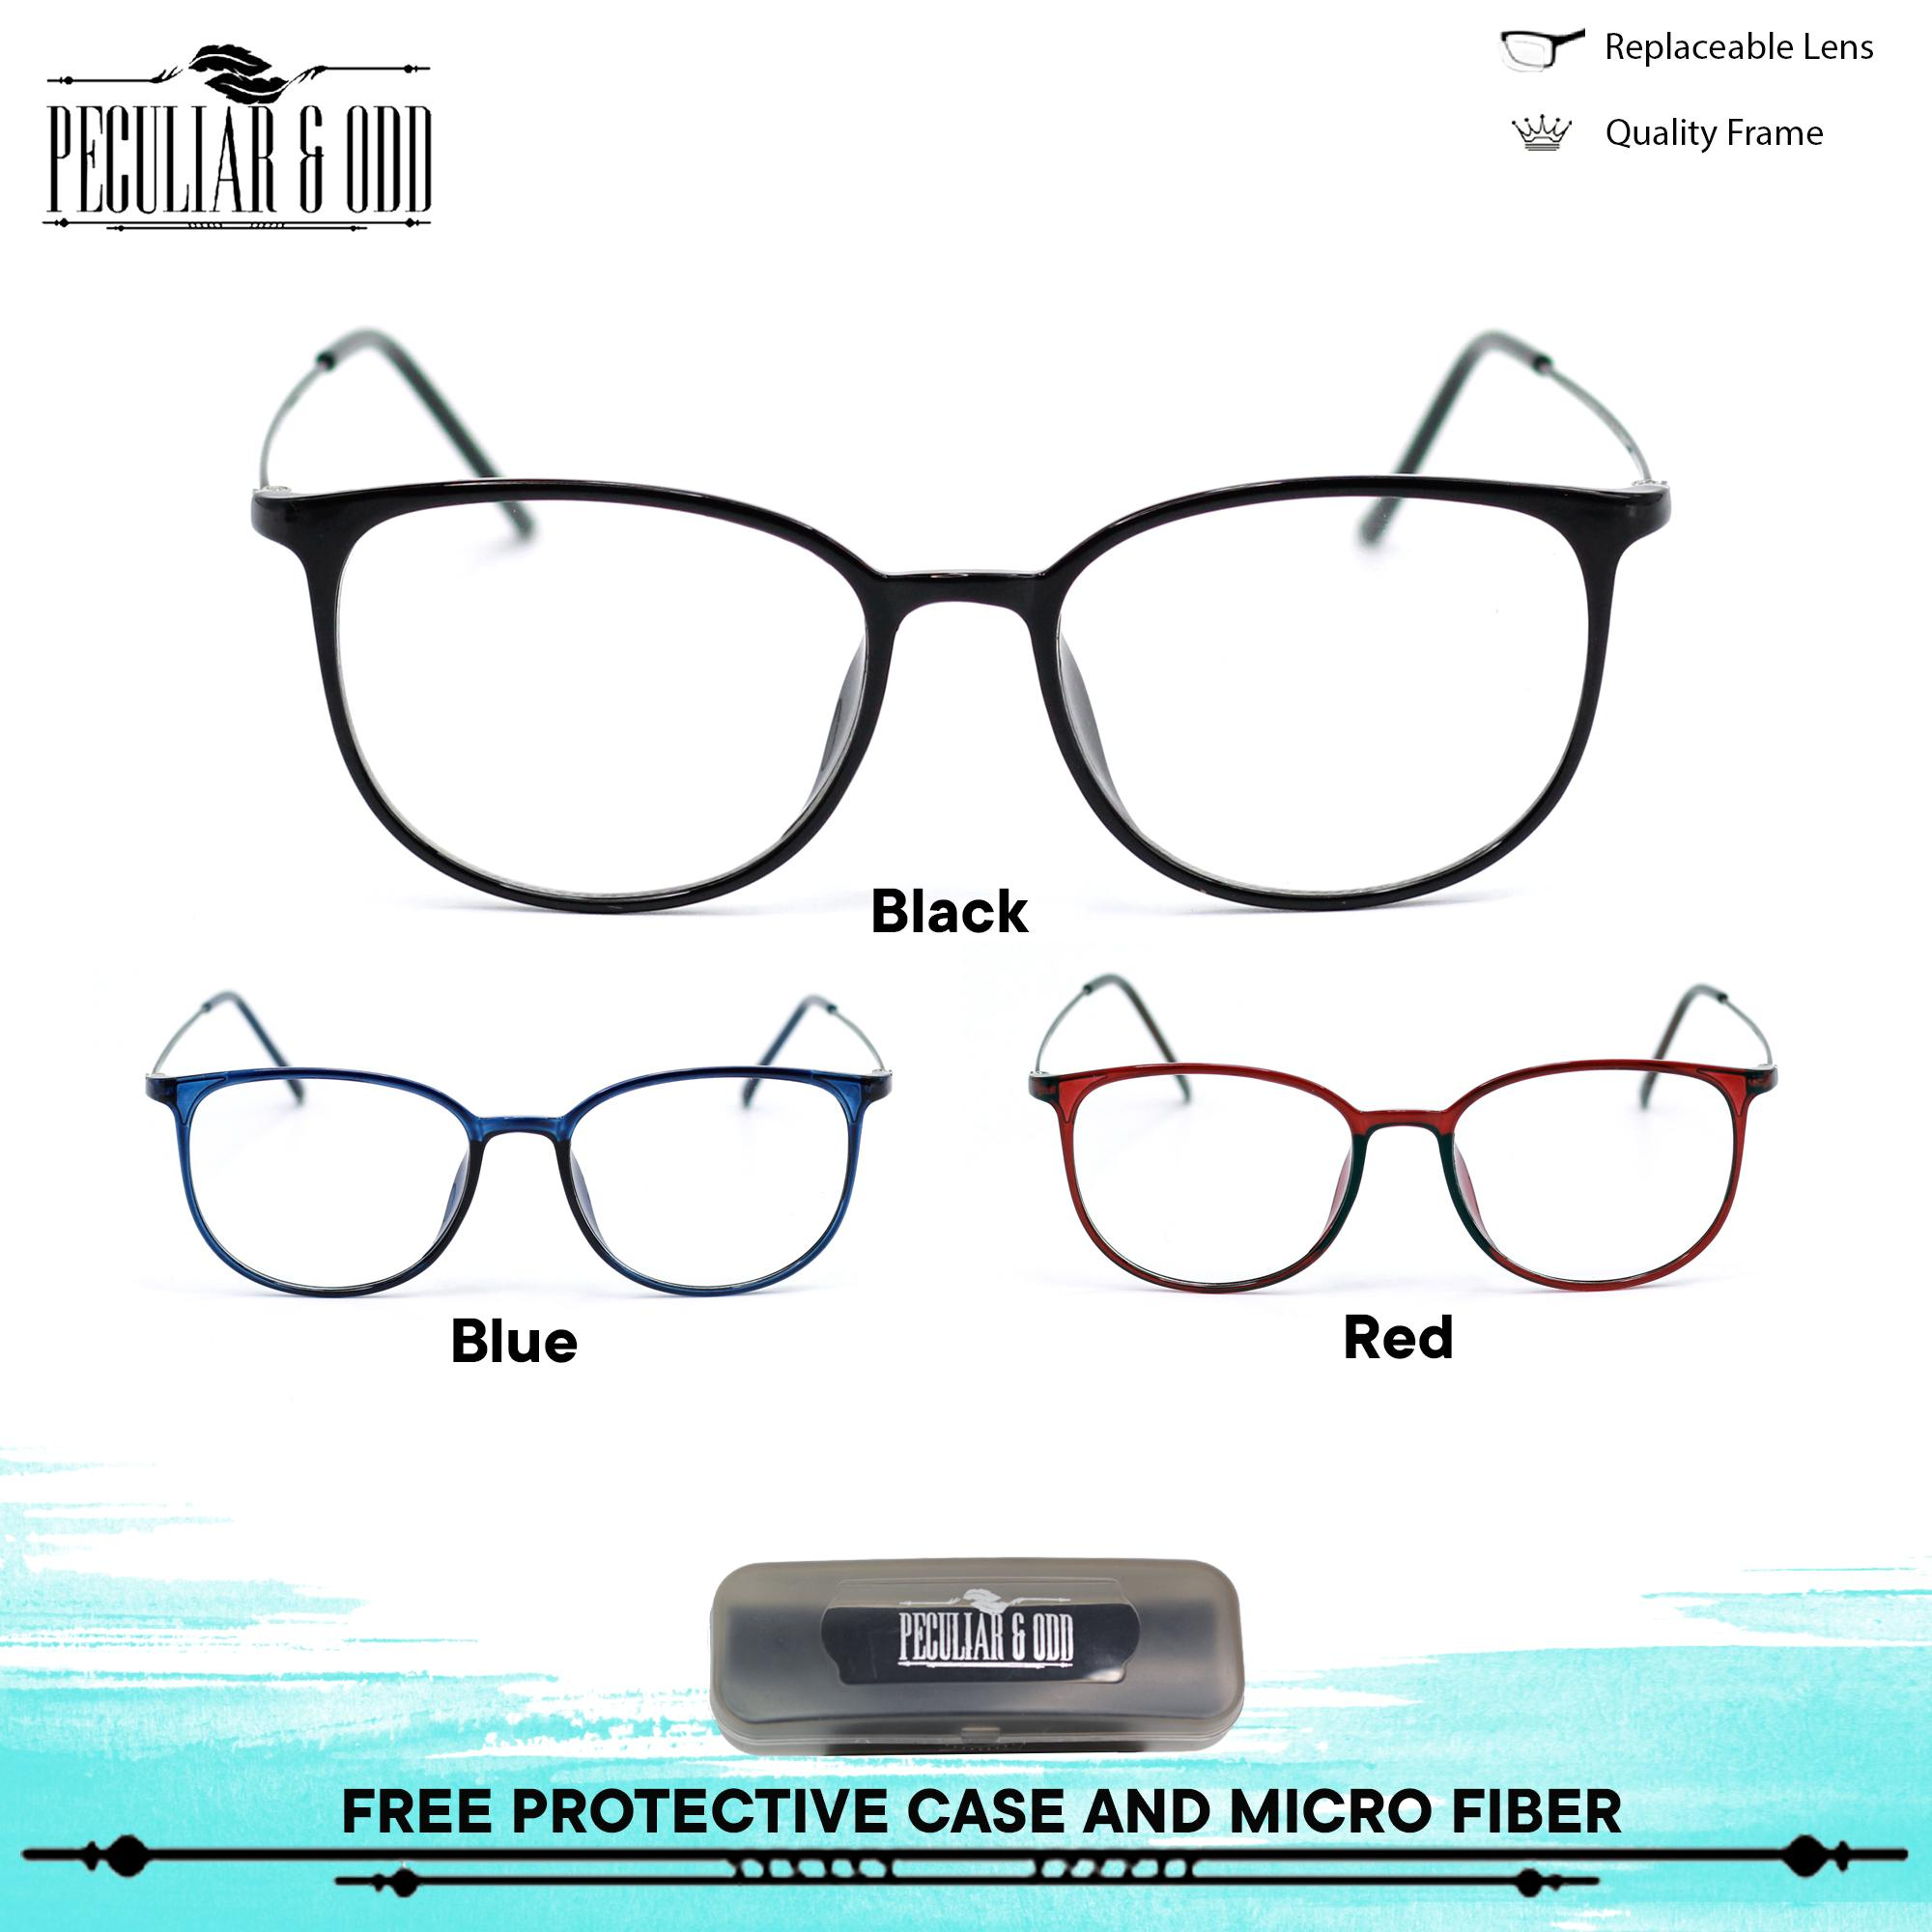 a6d352d0af Peculiar Round Eyeglasses 872 Lenses Lightweight Replaceable Optical Lens  Unisex Eyewear